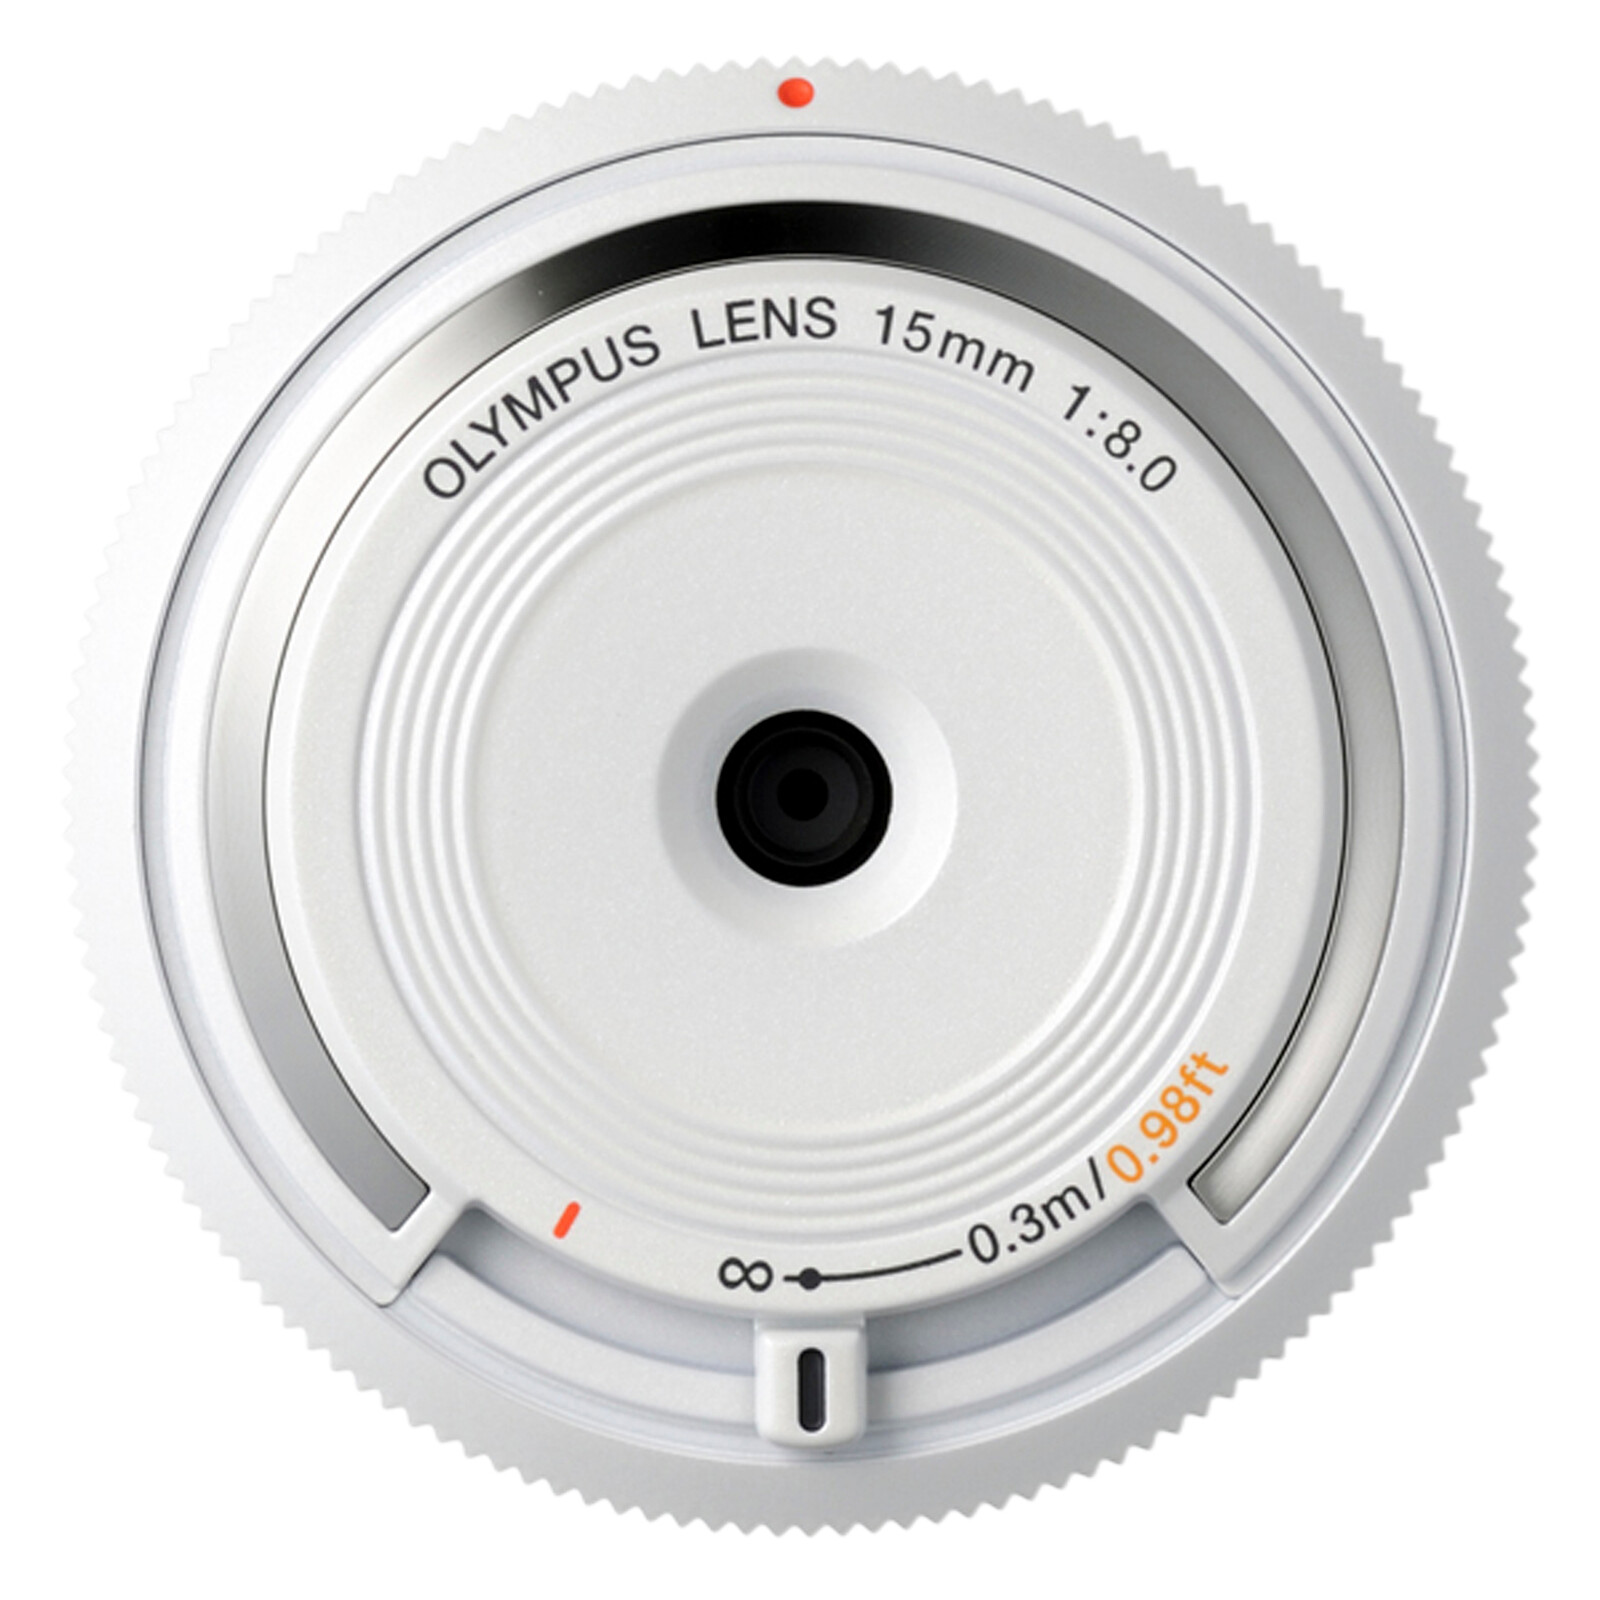 Olympus BCL-1580 Body Cap Lens